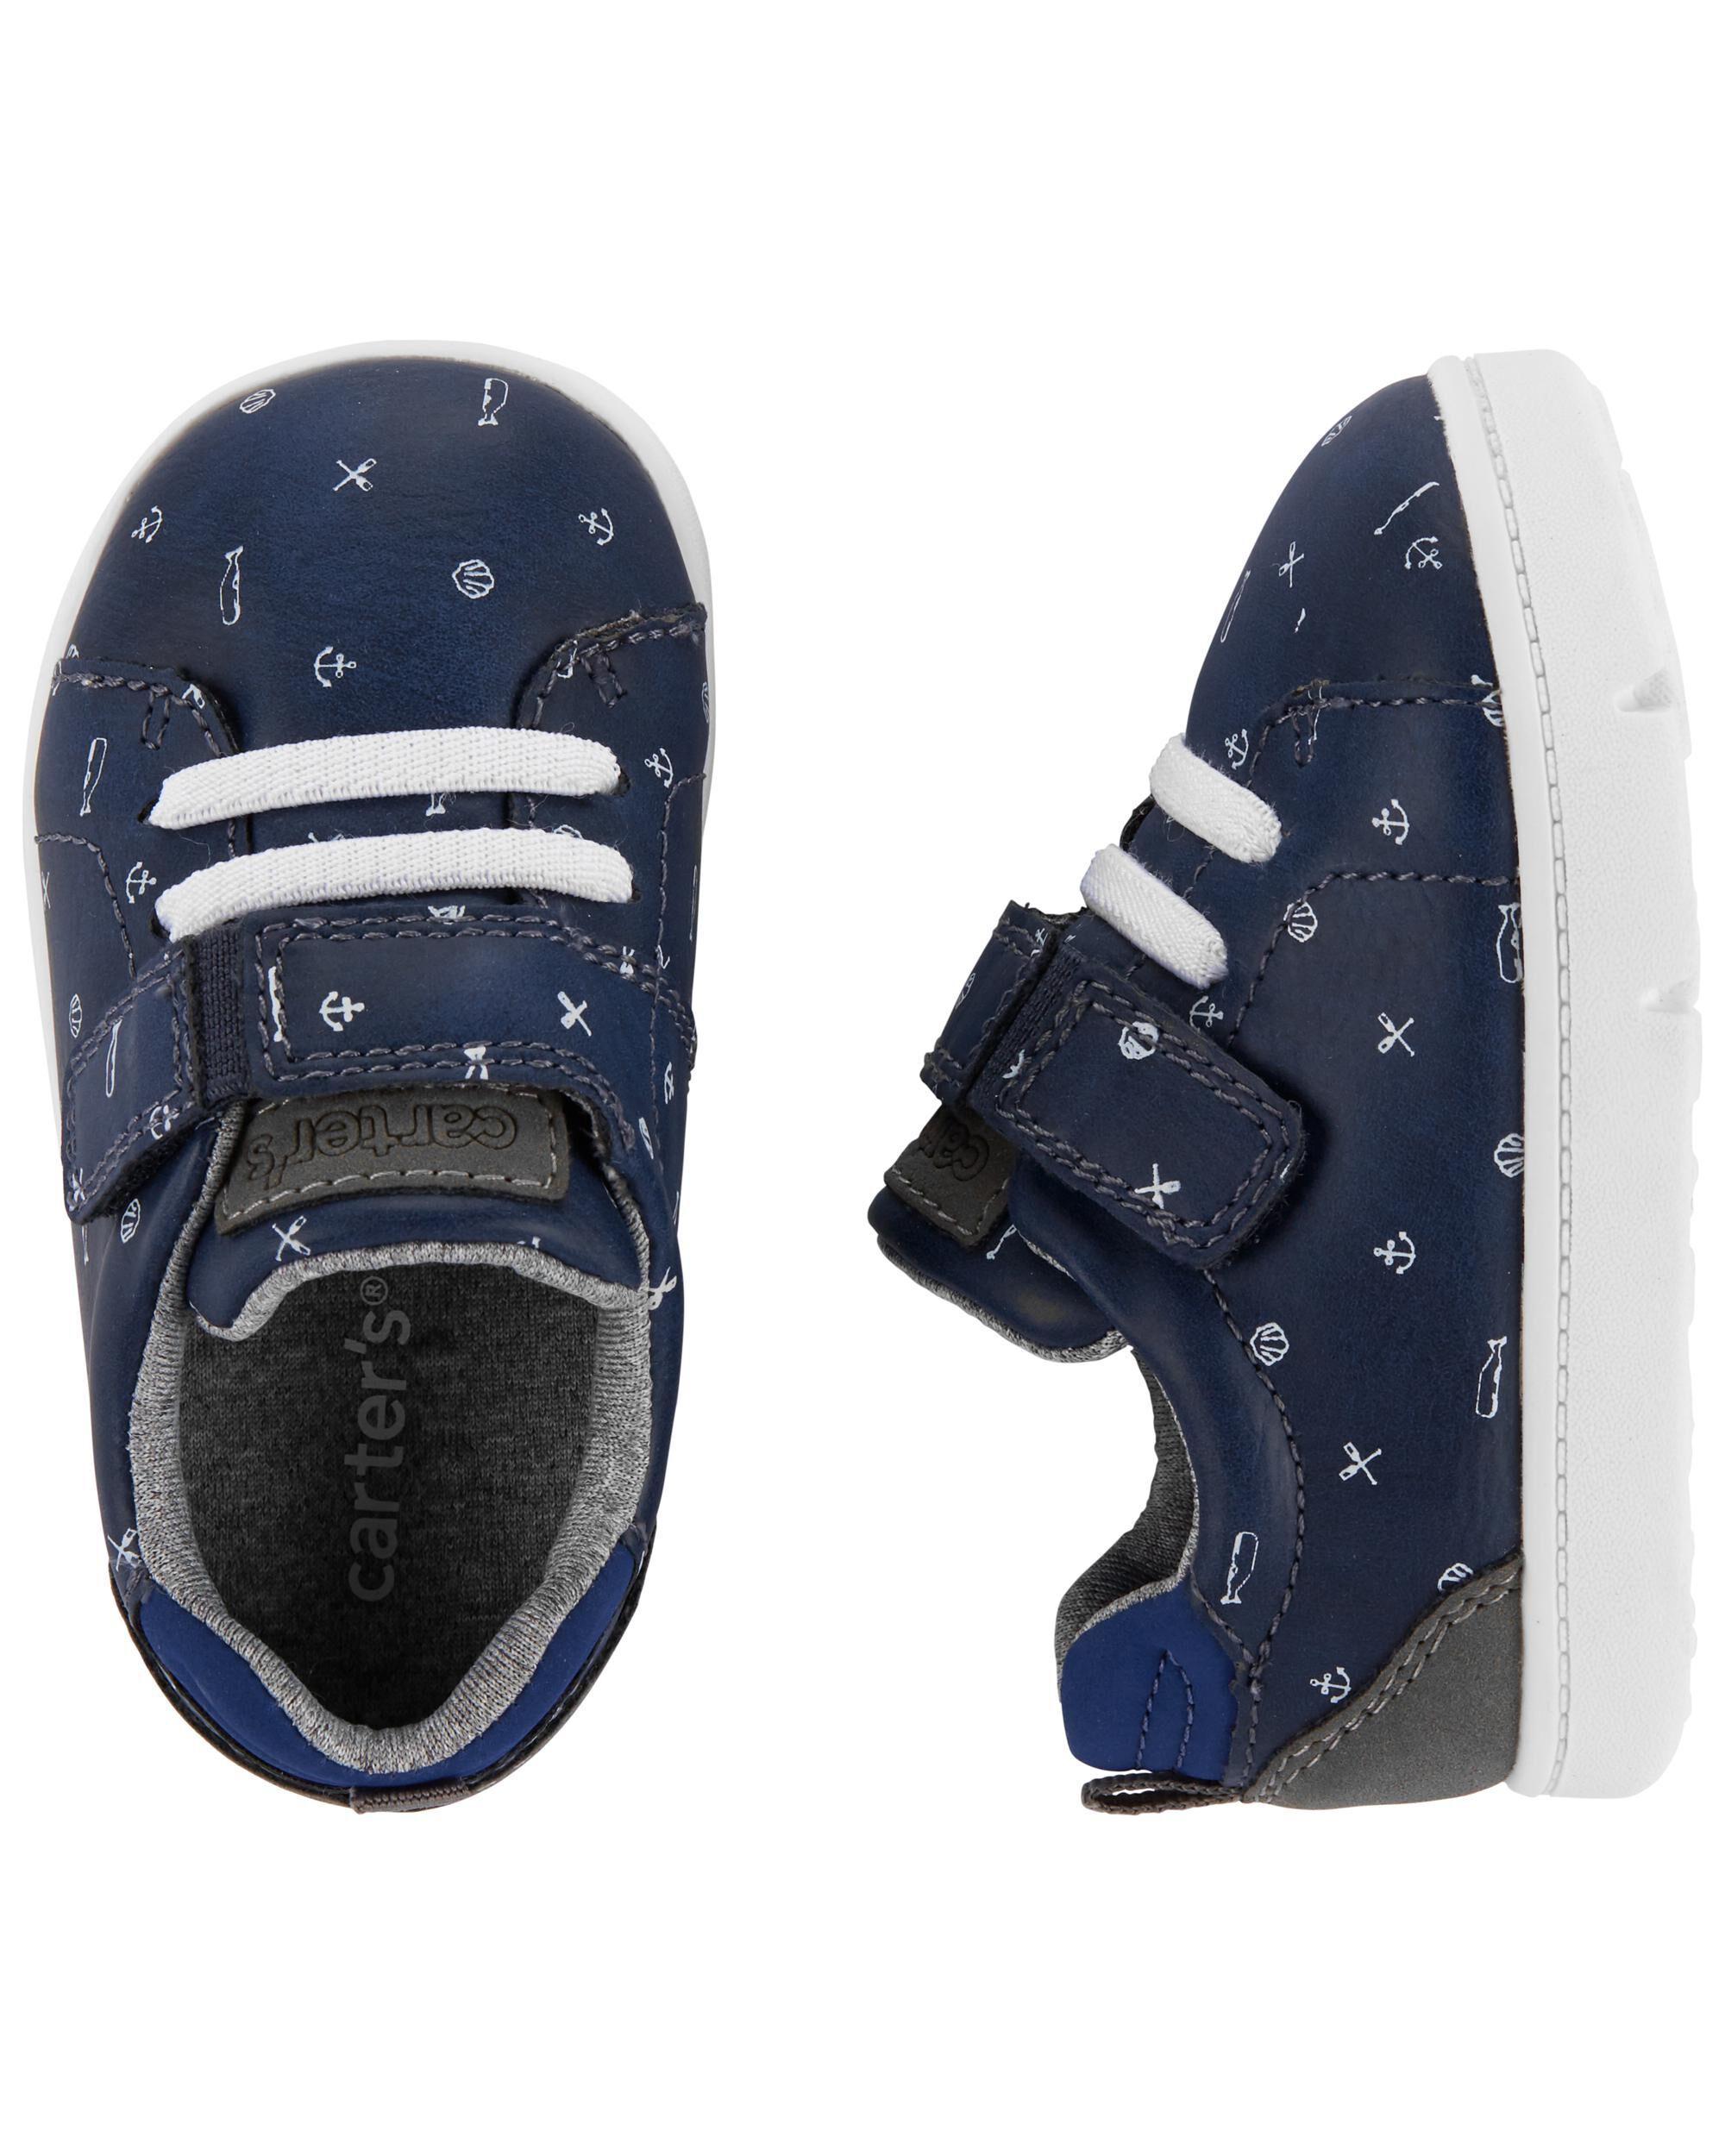 Oshkoshbgosh Carters Every Step Sneakers